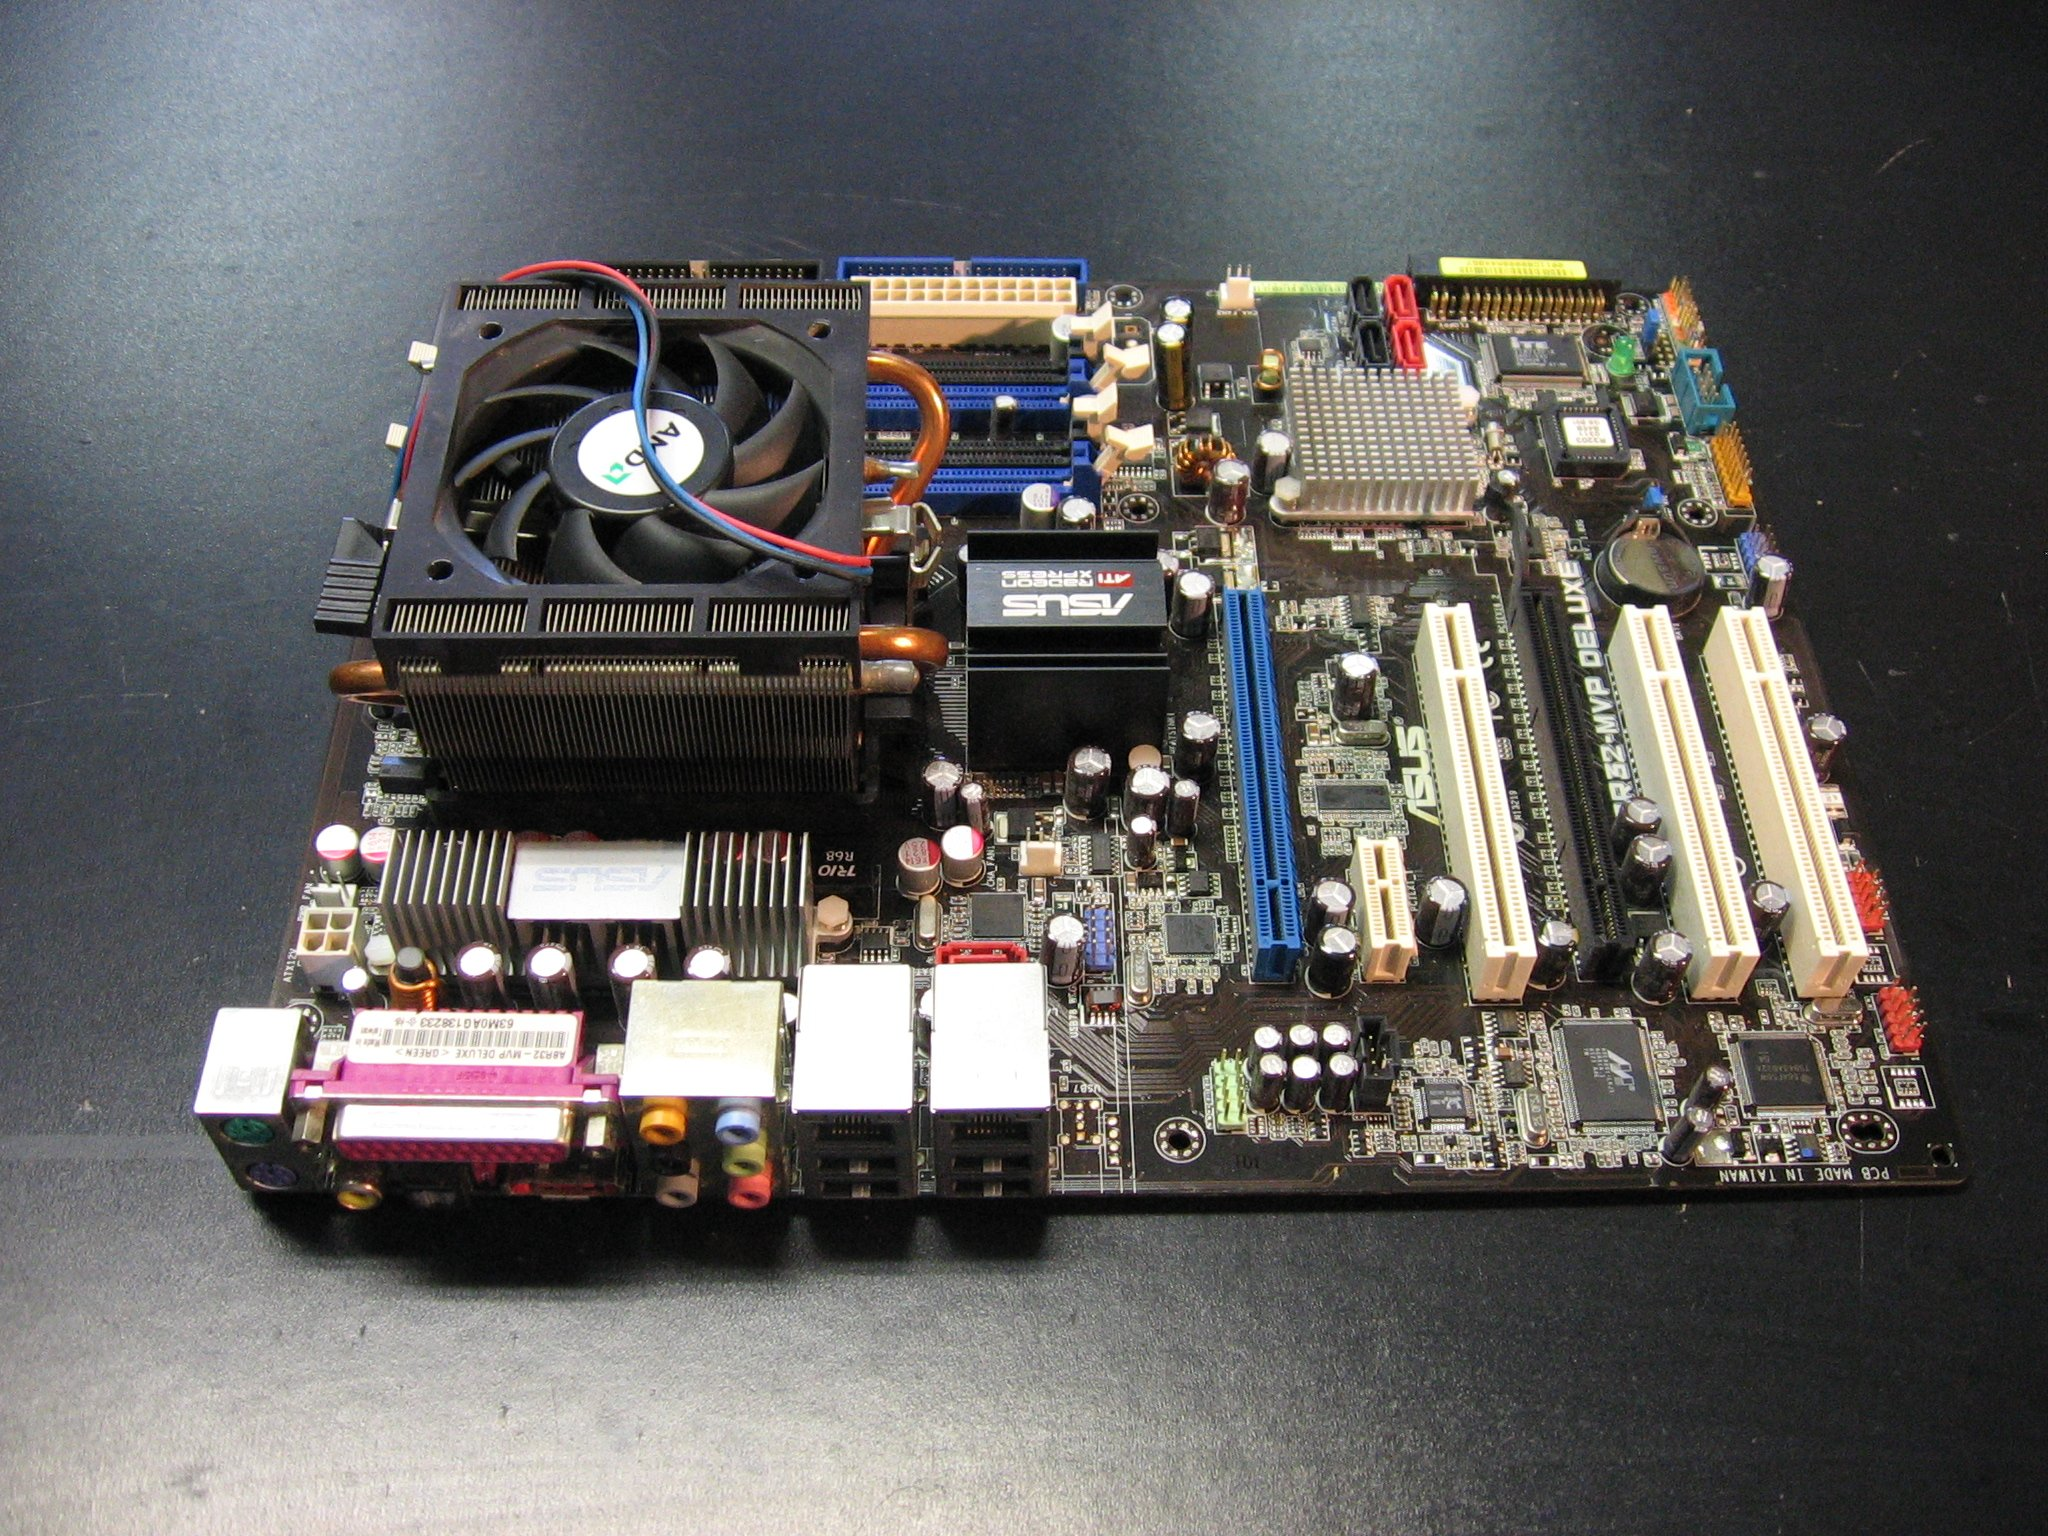 Płyta Asus A8R32-MVP Deluxe + AMD Athlon 64 X2 4800 + Radiator Opole AlleOpole.pl